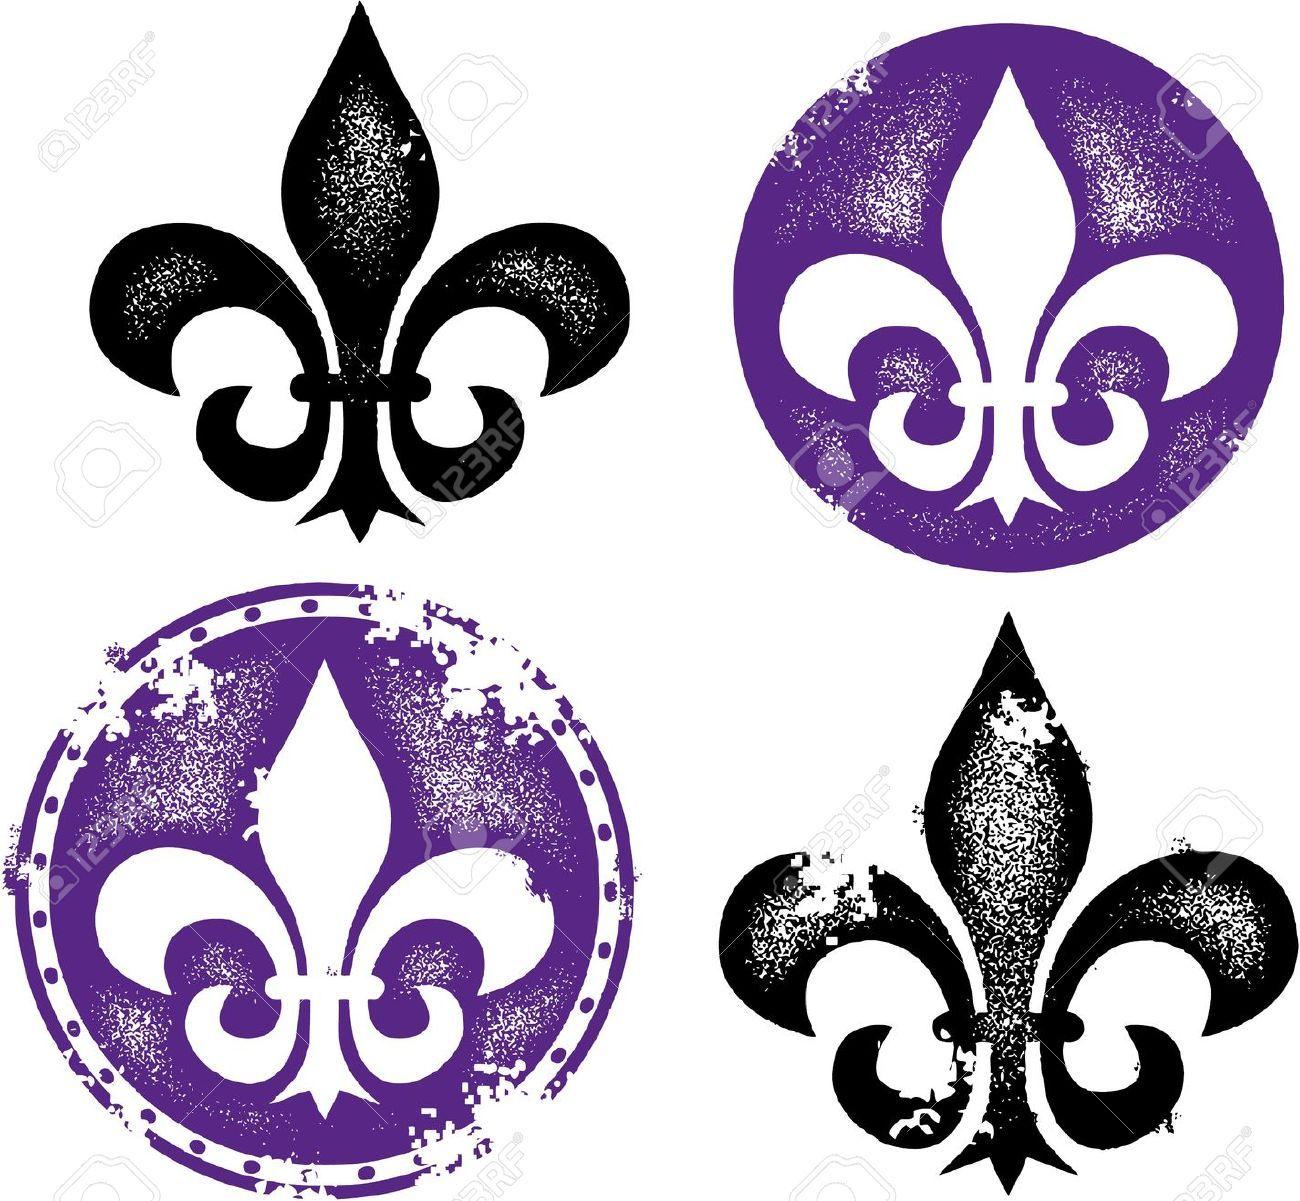 Distressed Fleur De Lis Designs Royalty Free Cliparts